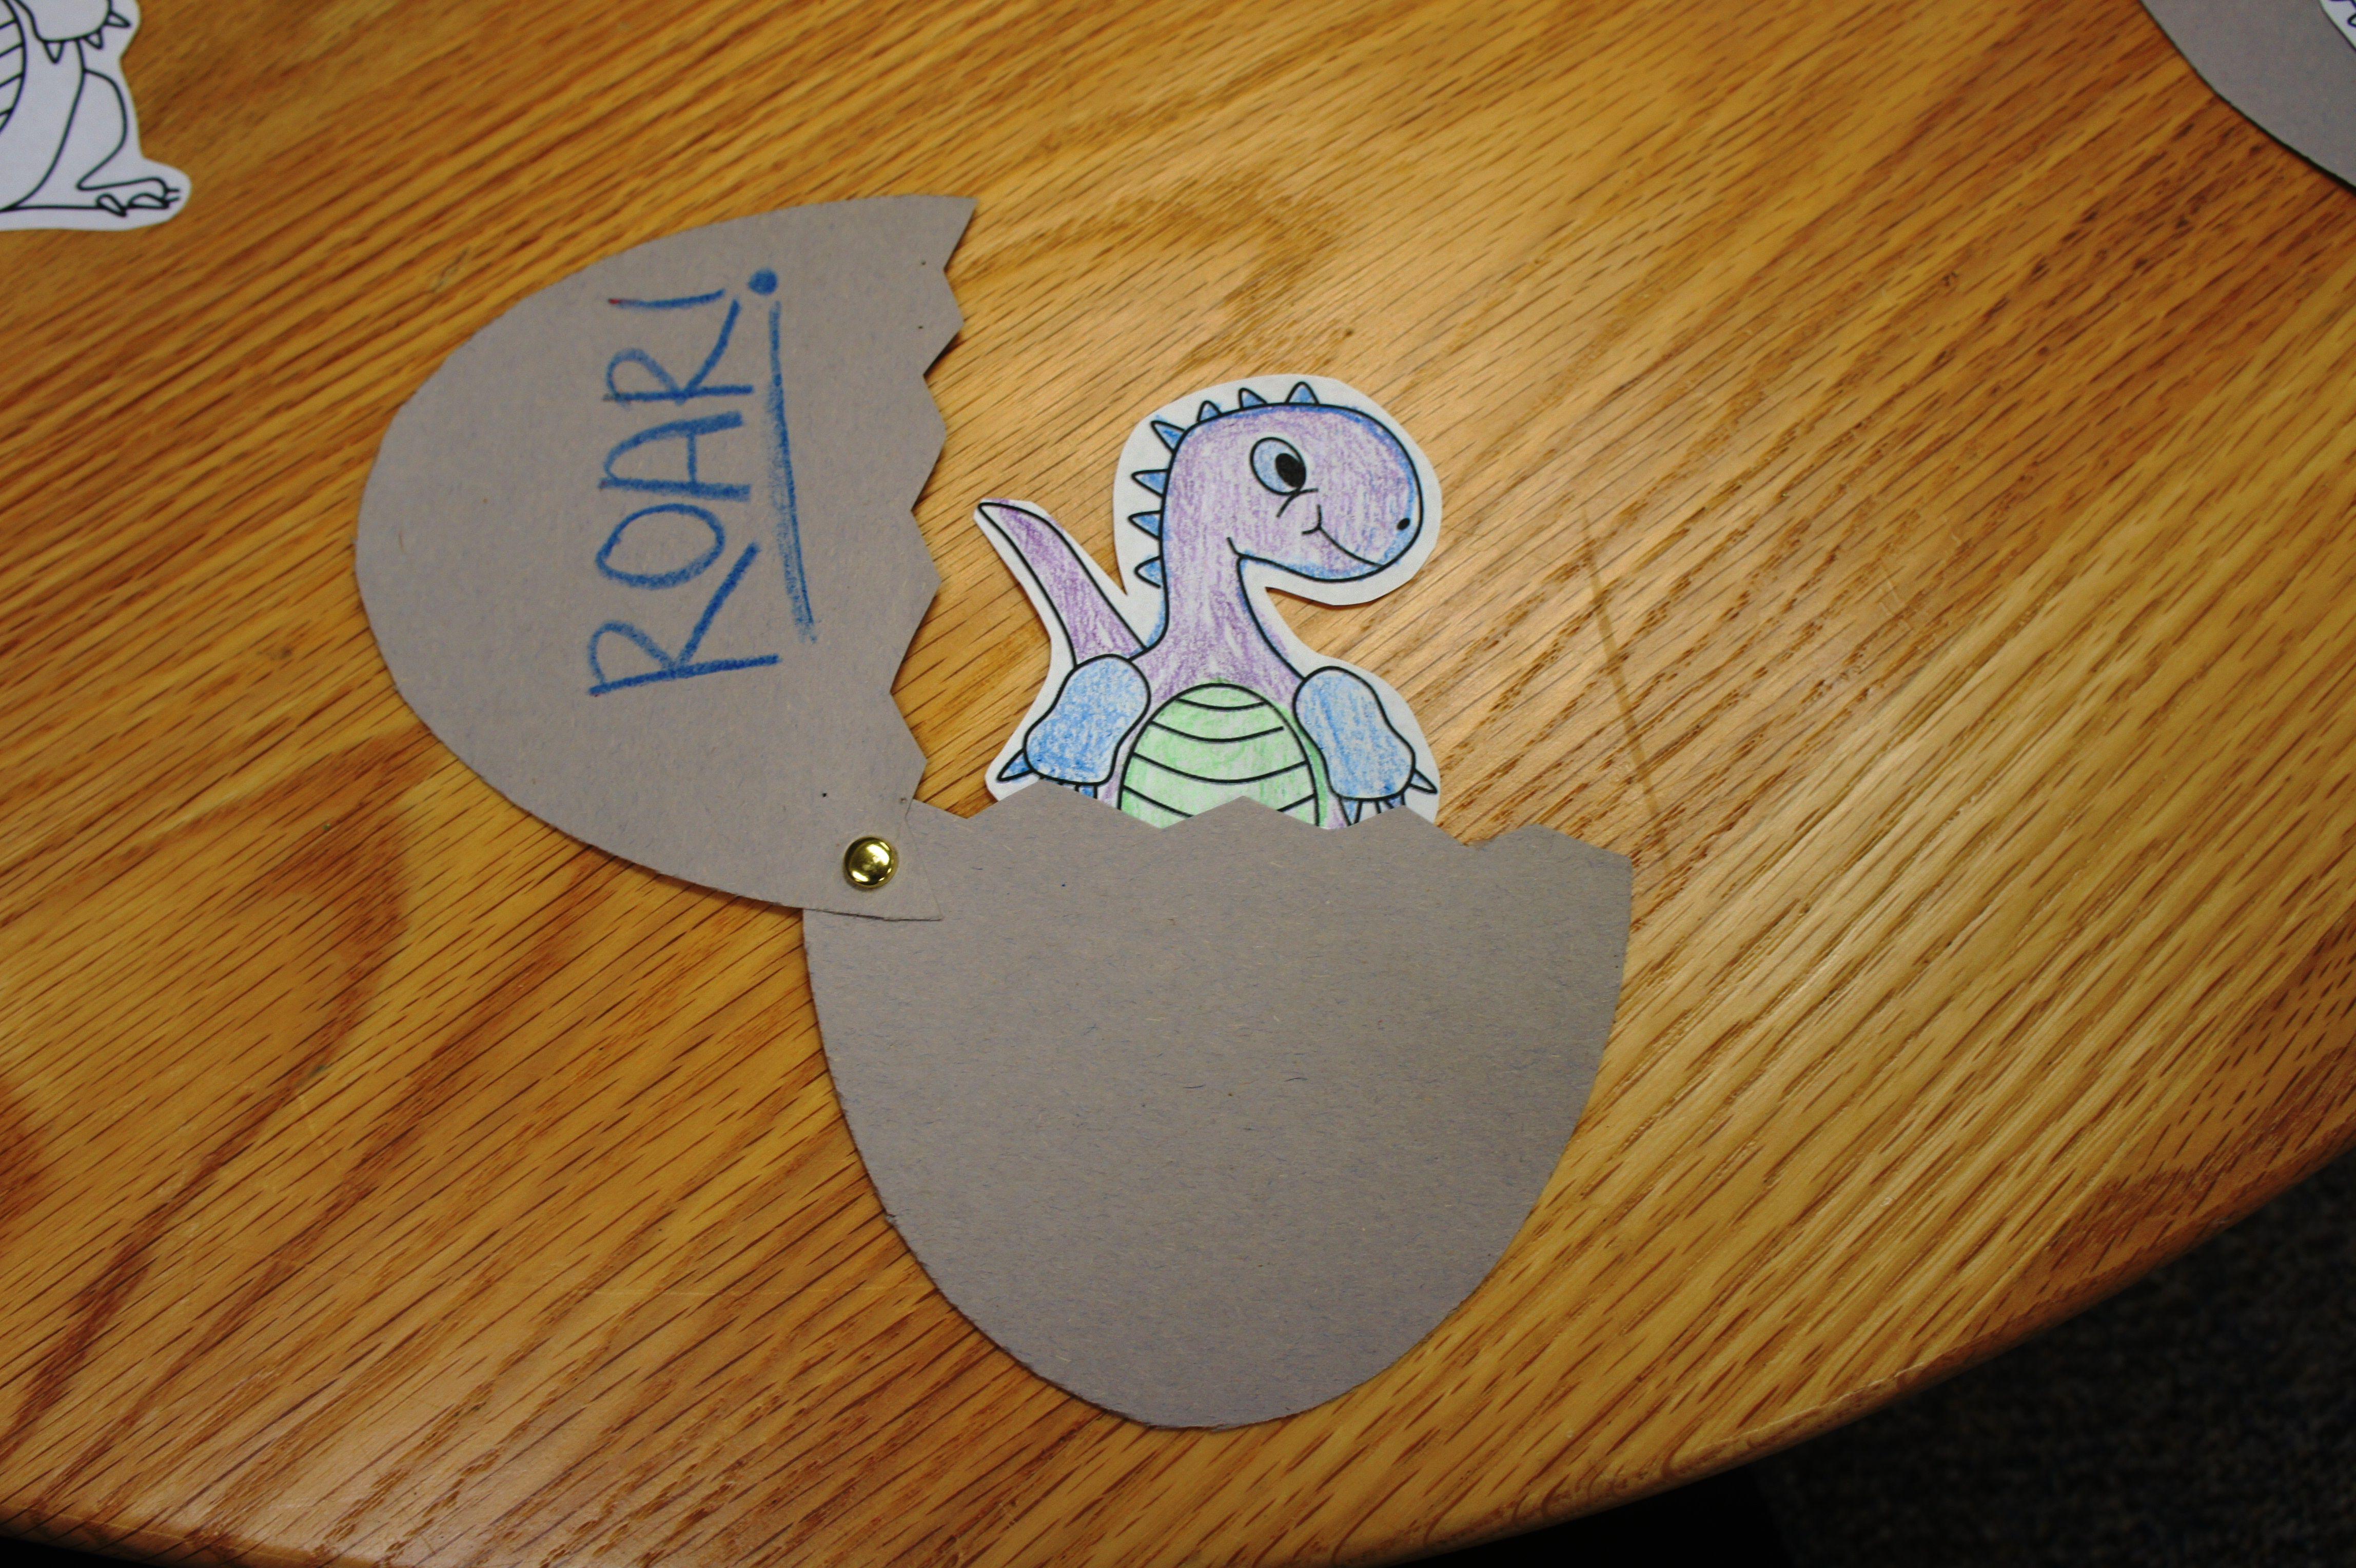 Essay On Dinosaurs For Kids